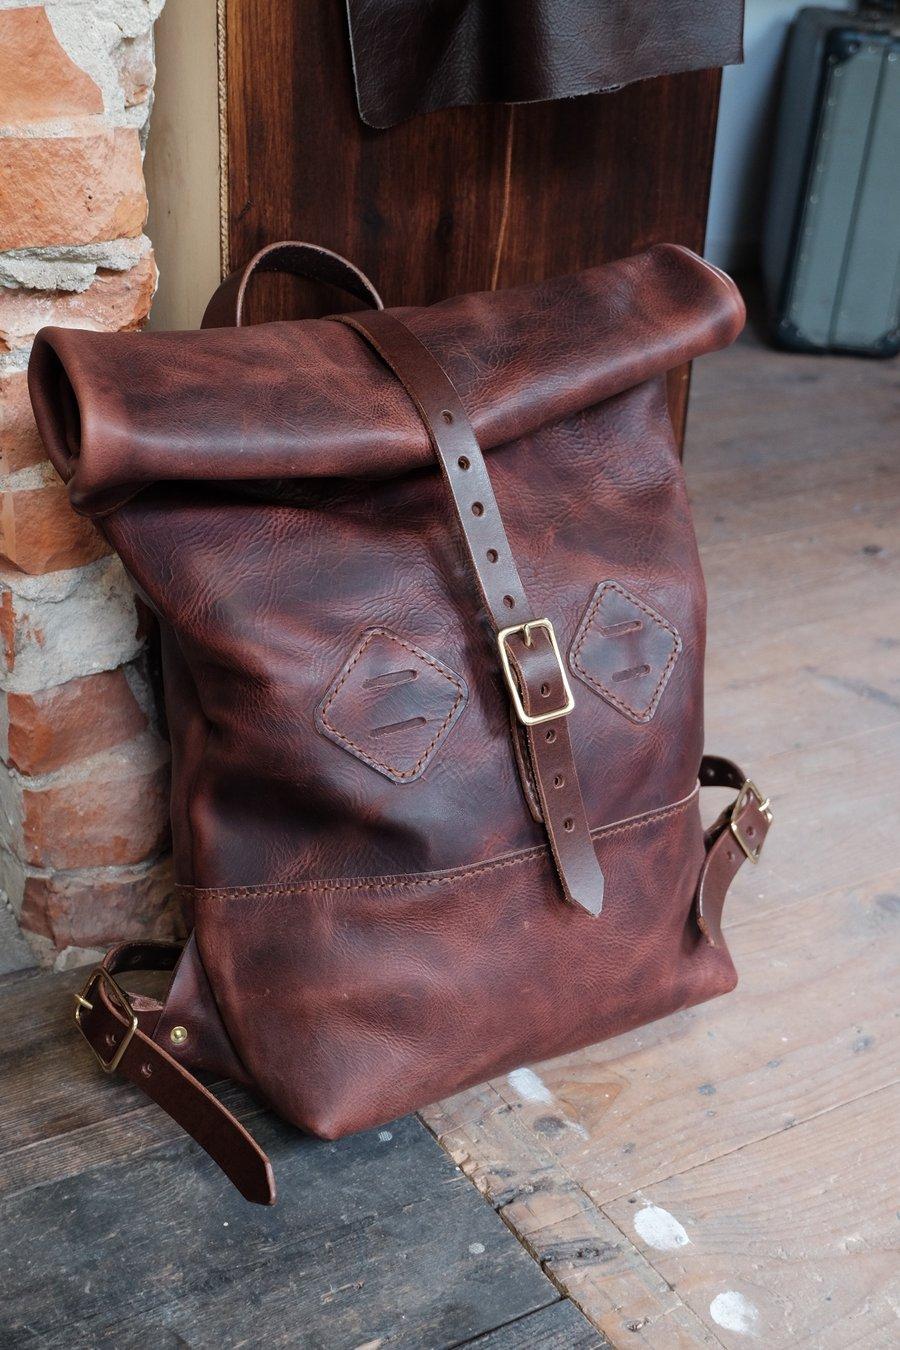 Image of Old Dutch rolltop backpack